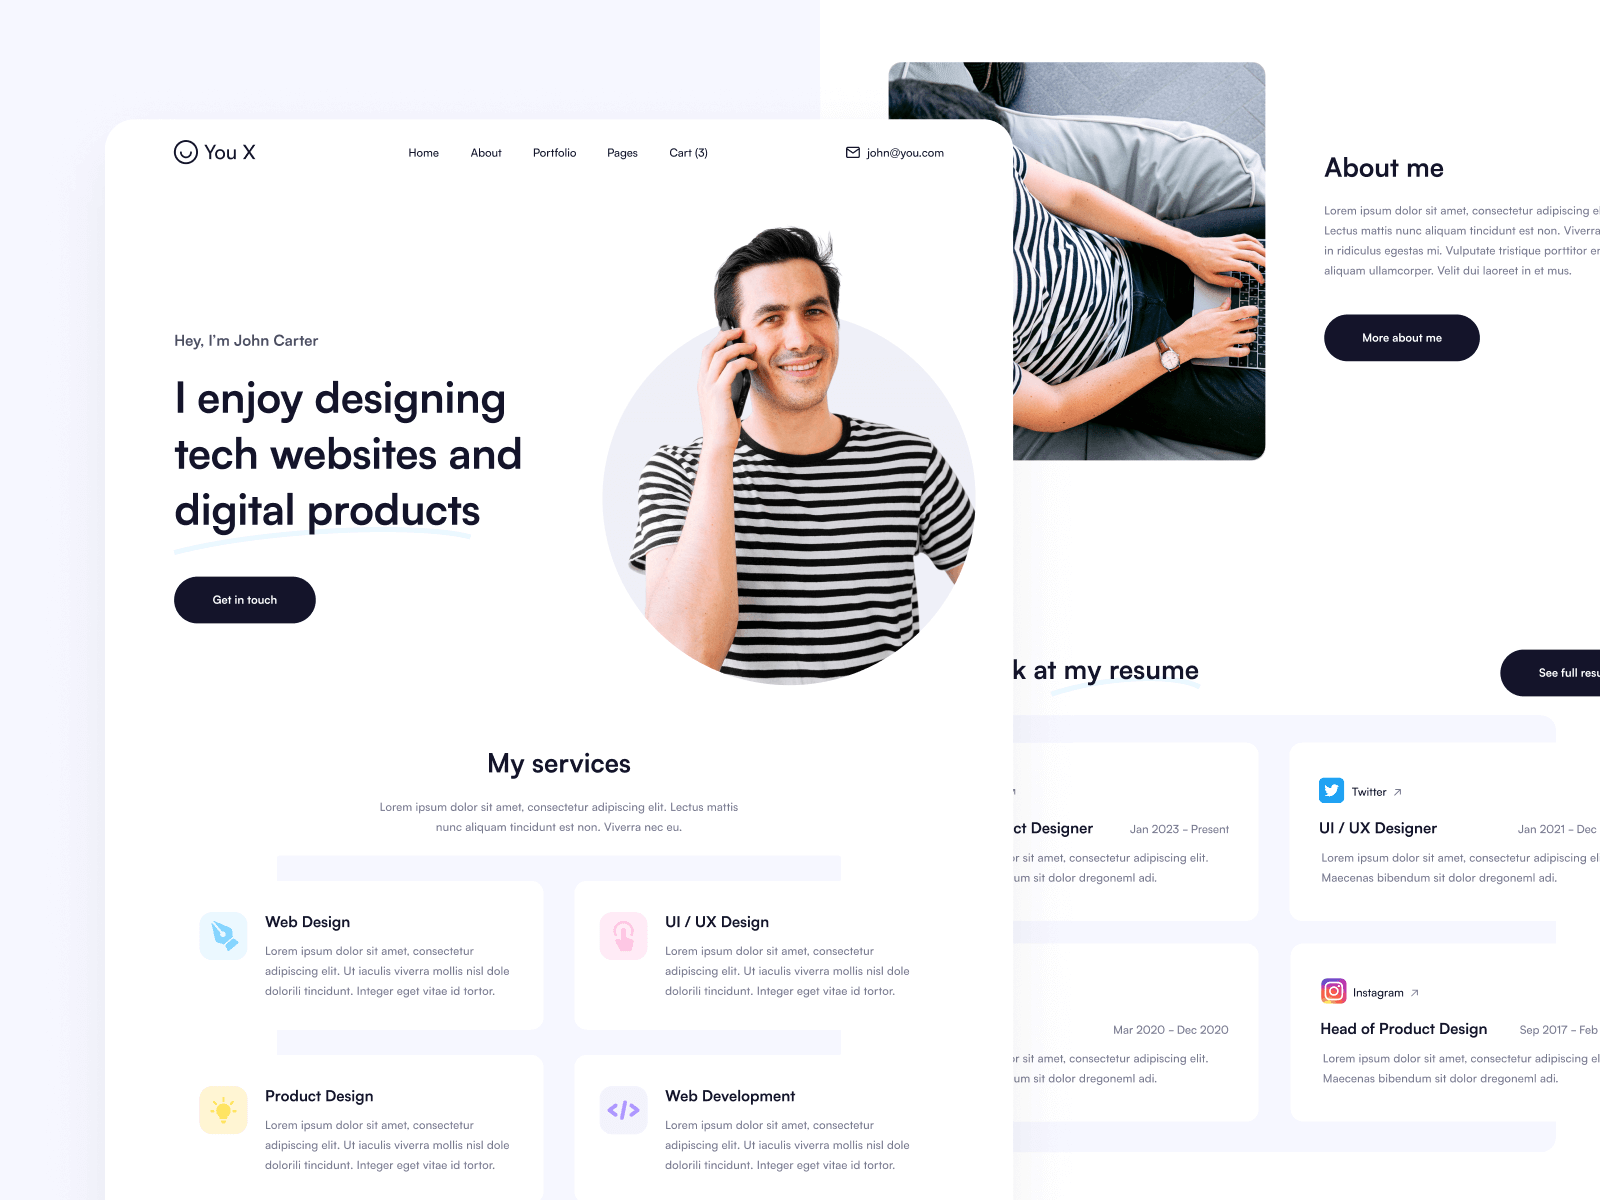 Personal Brand Webflow Template